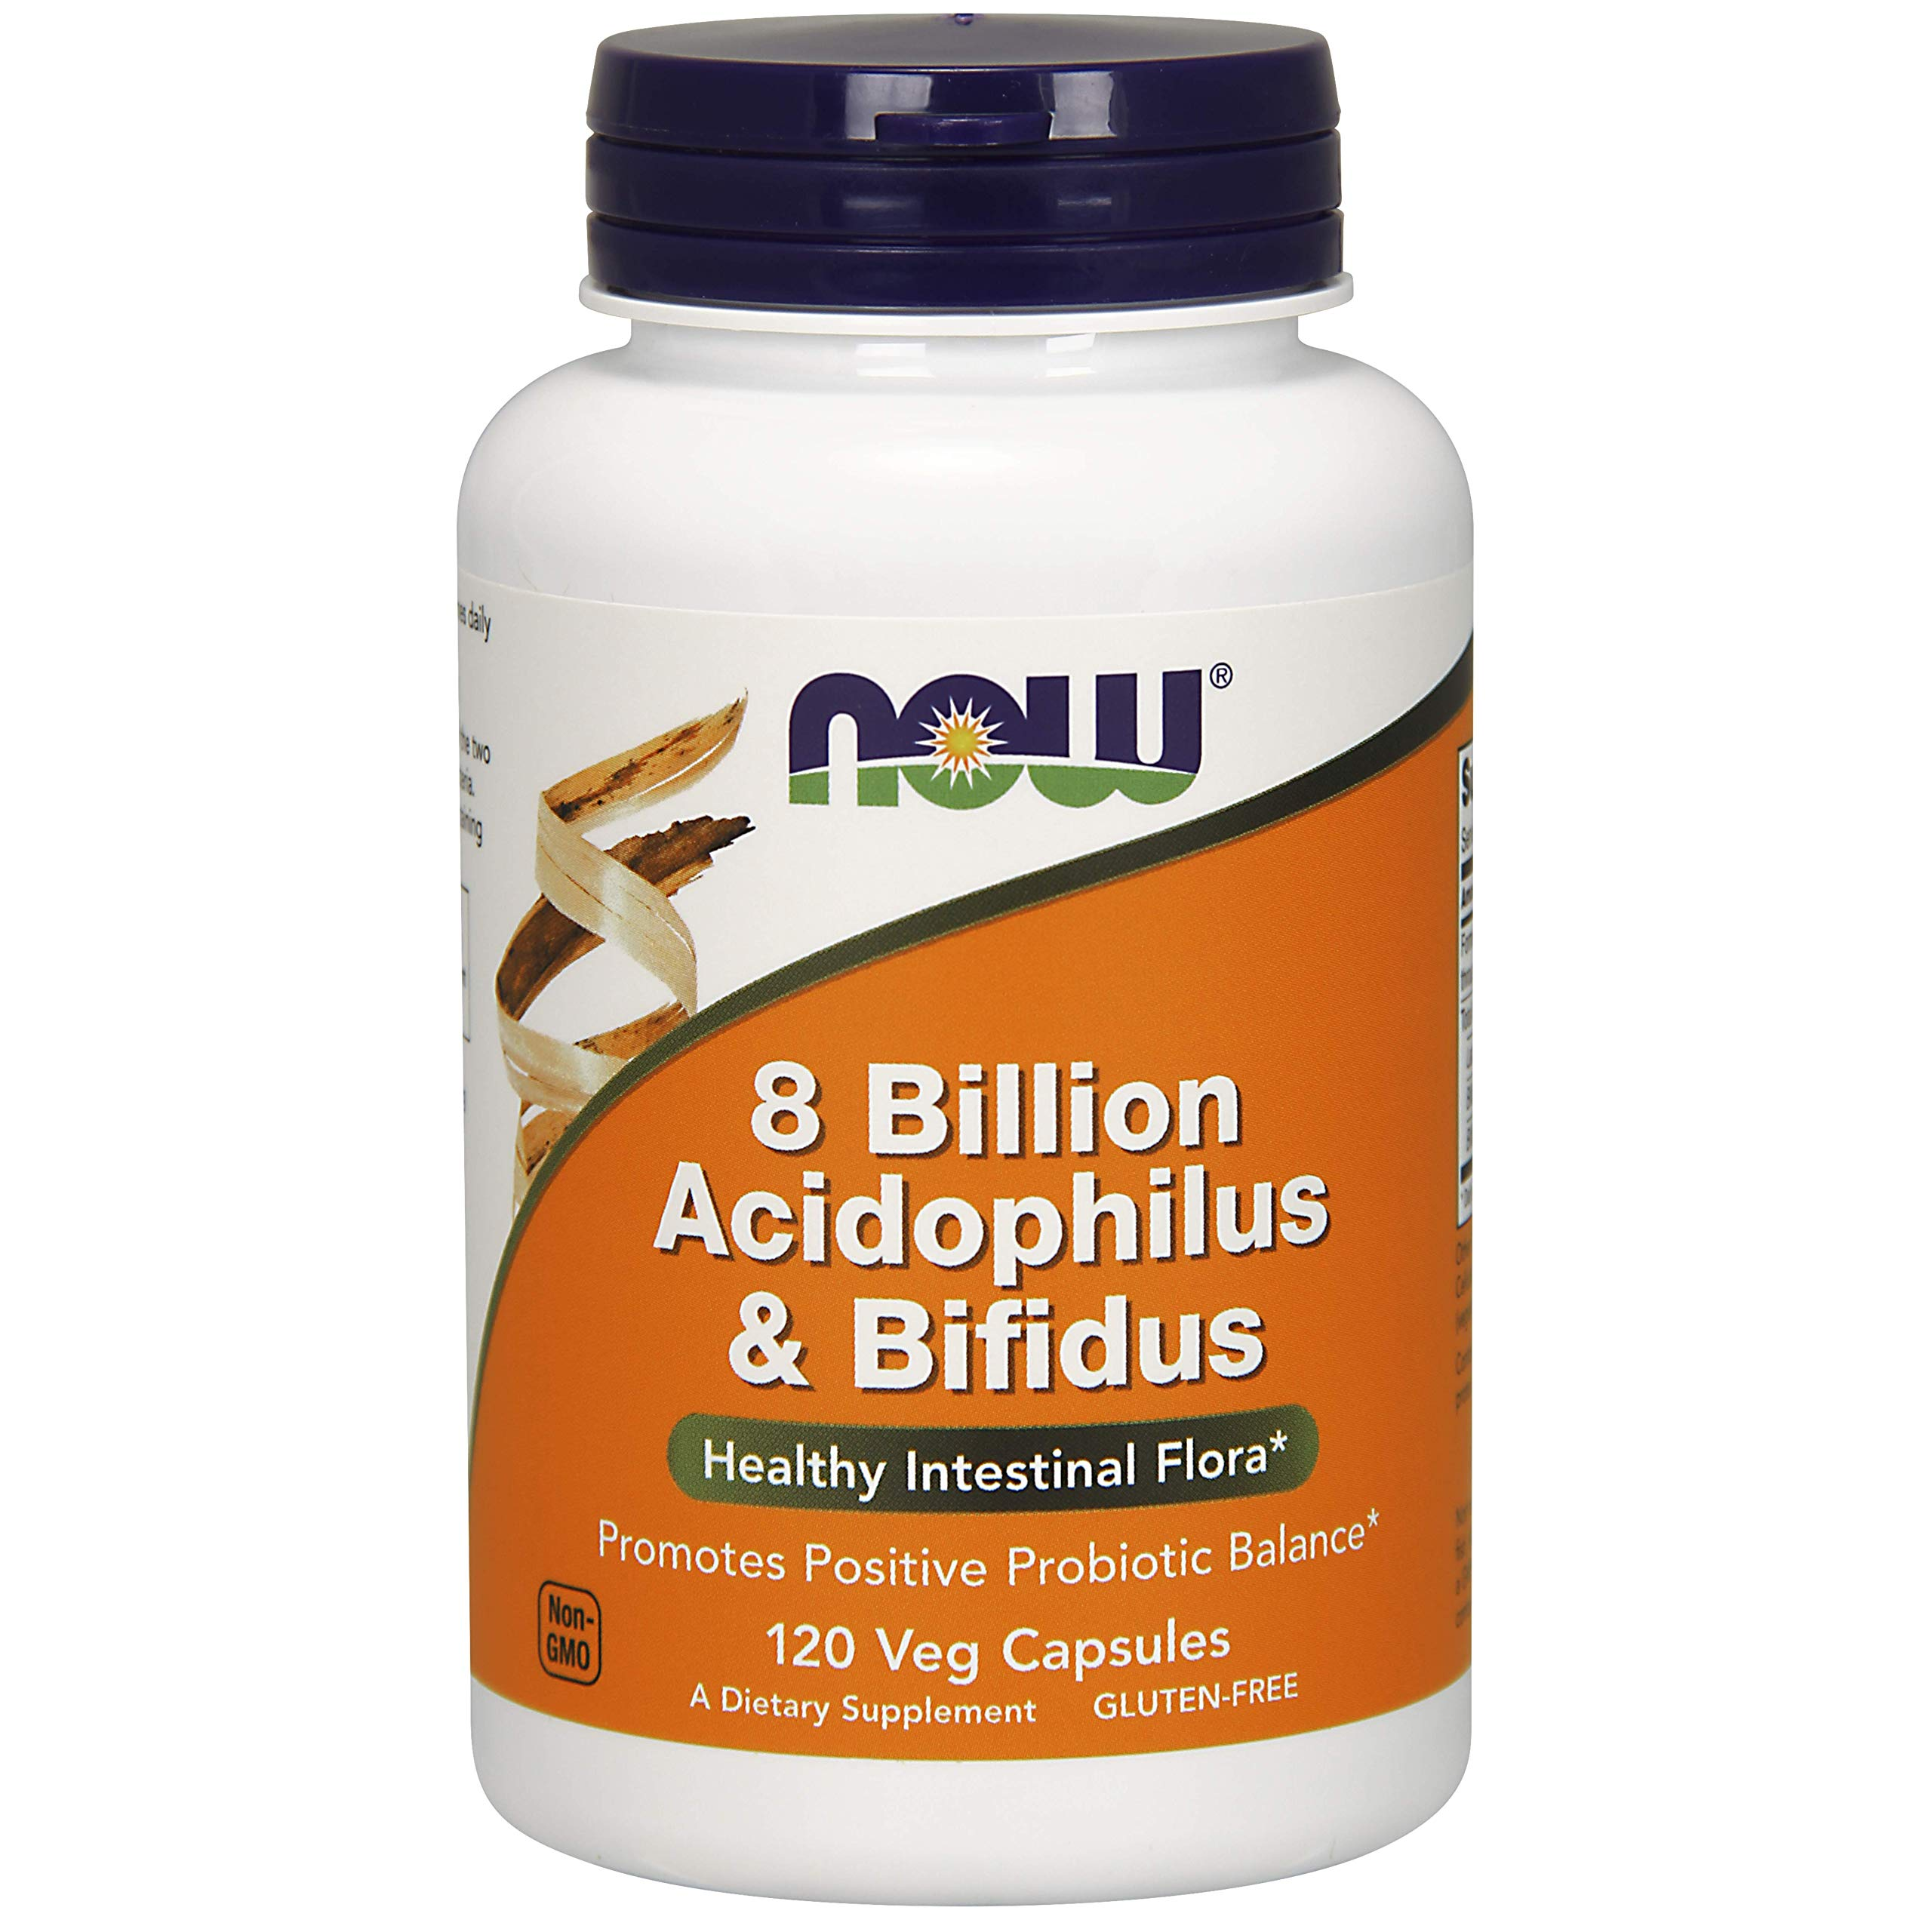 NOW Foods - 8 Billion Acidophilus & Bifidus 120 vcap by NOW Foods